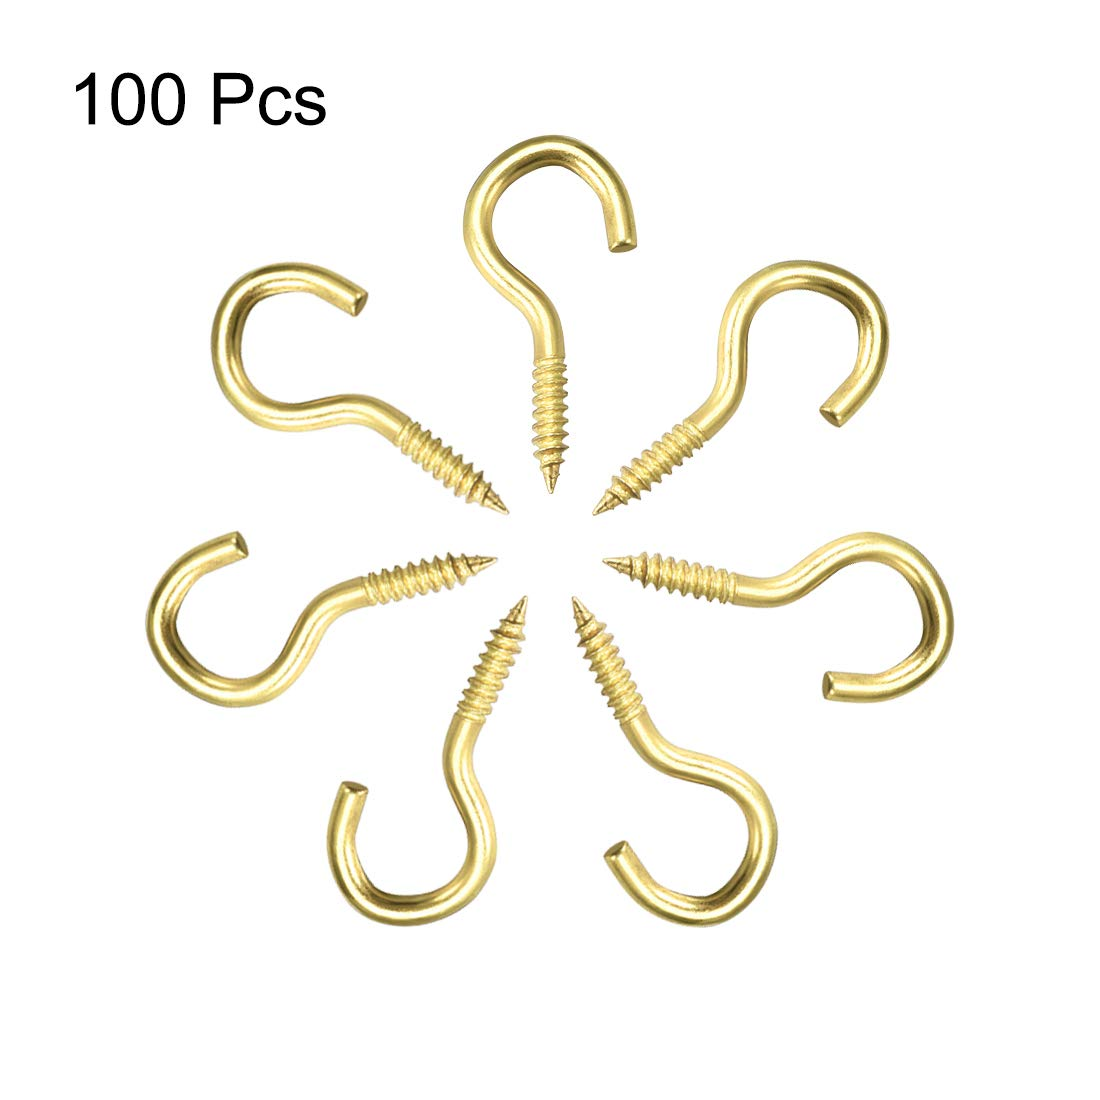 100 unidades color dorado Ganchos de tornillo para ojales Sourcingmap